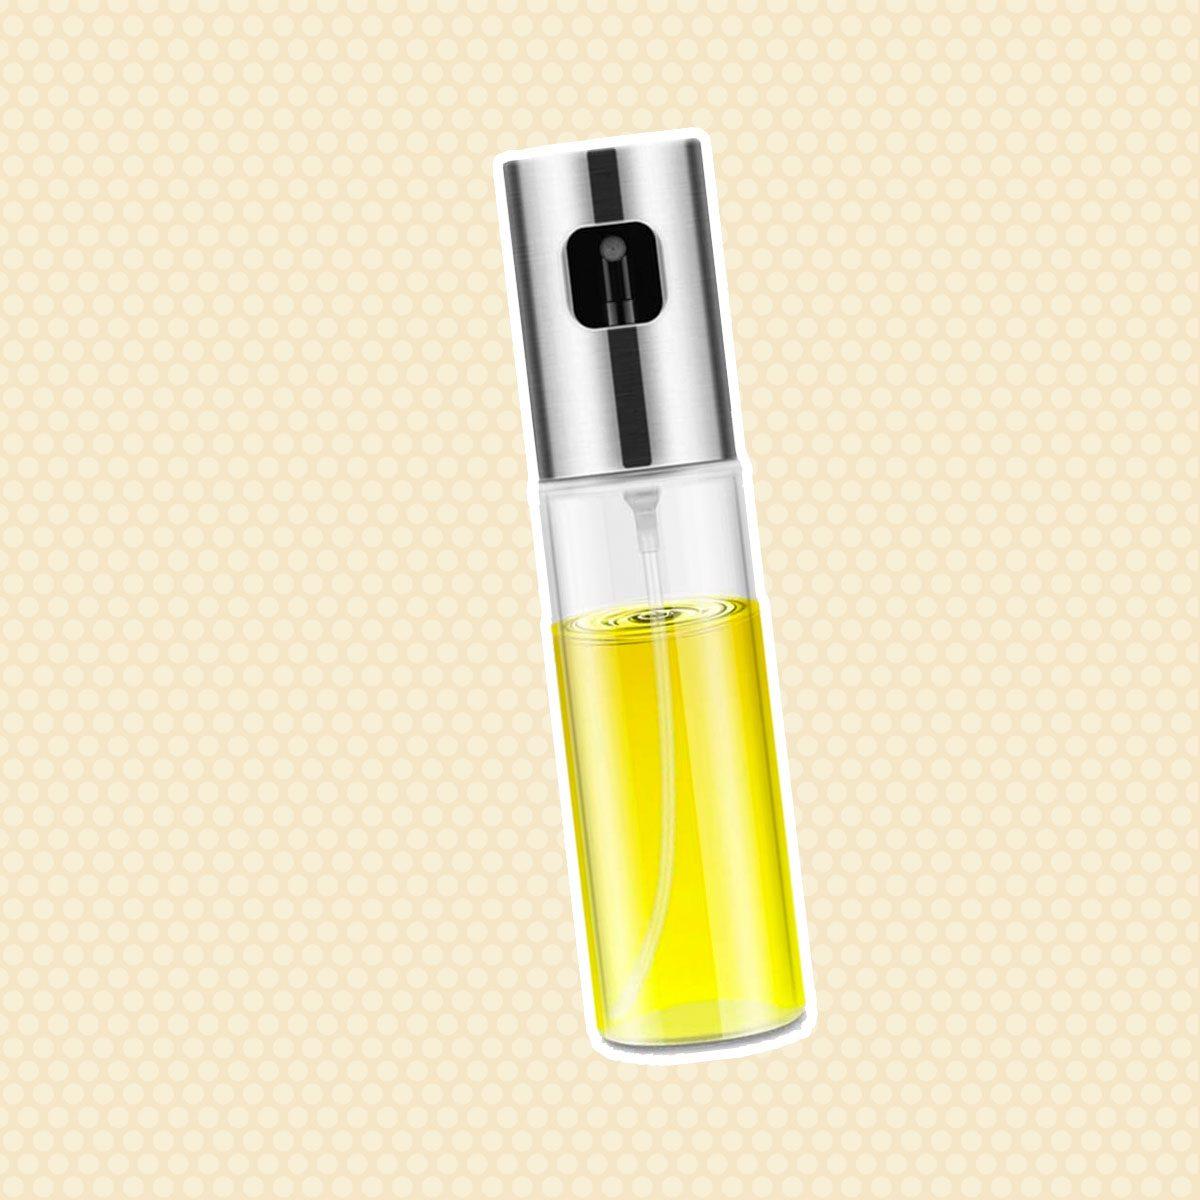 Olive Oil Sprayer for Cooking, Oil Spray Bottle Versatile Glass for Cooking, Baking, Roasting, Grilling